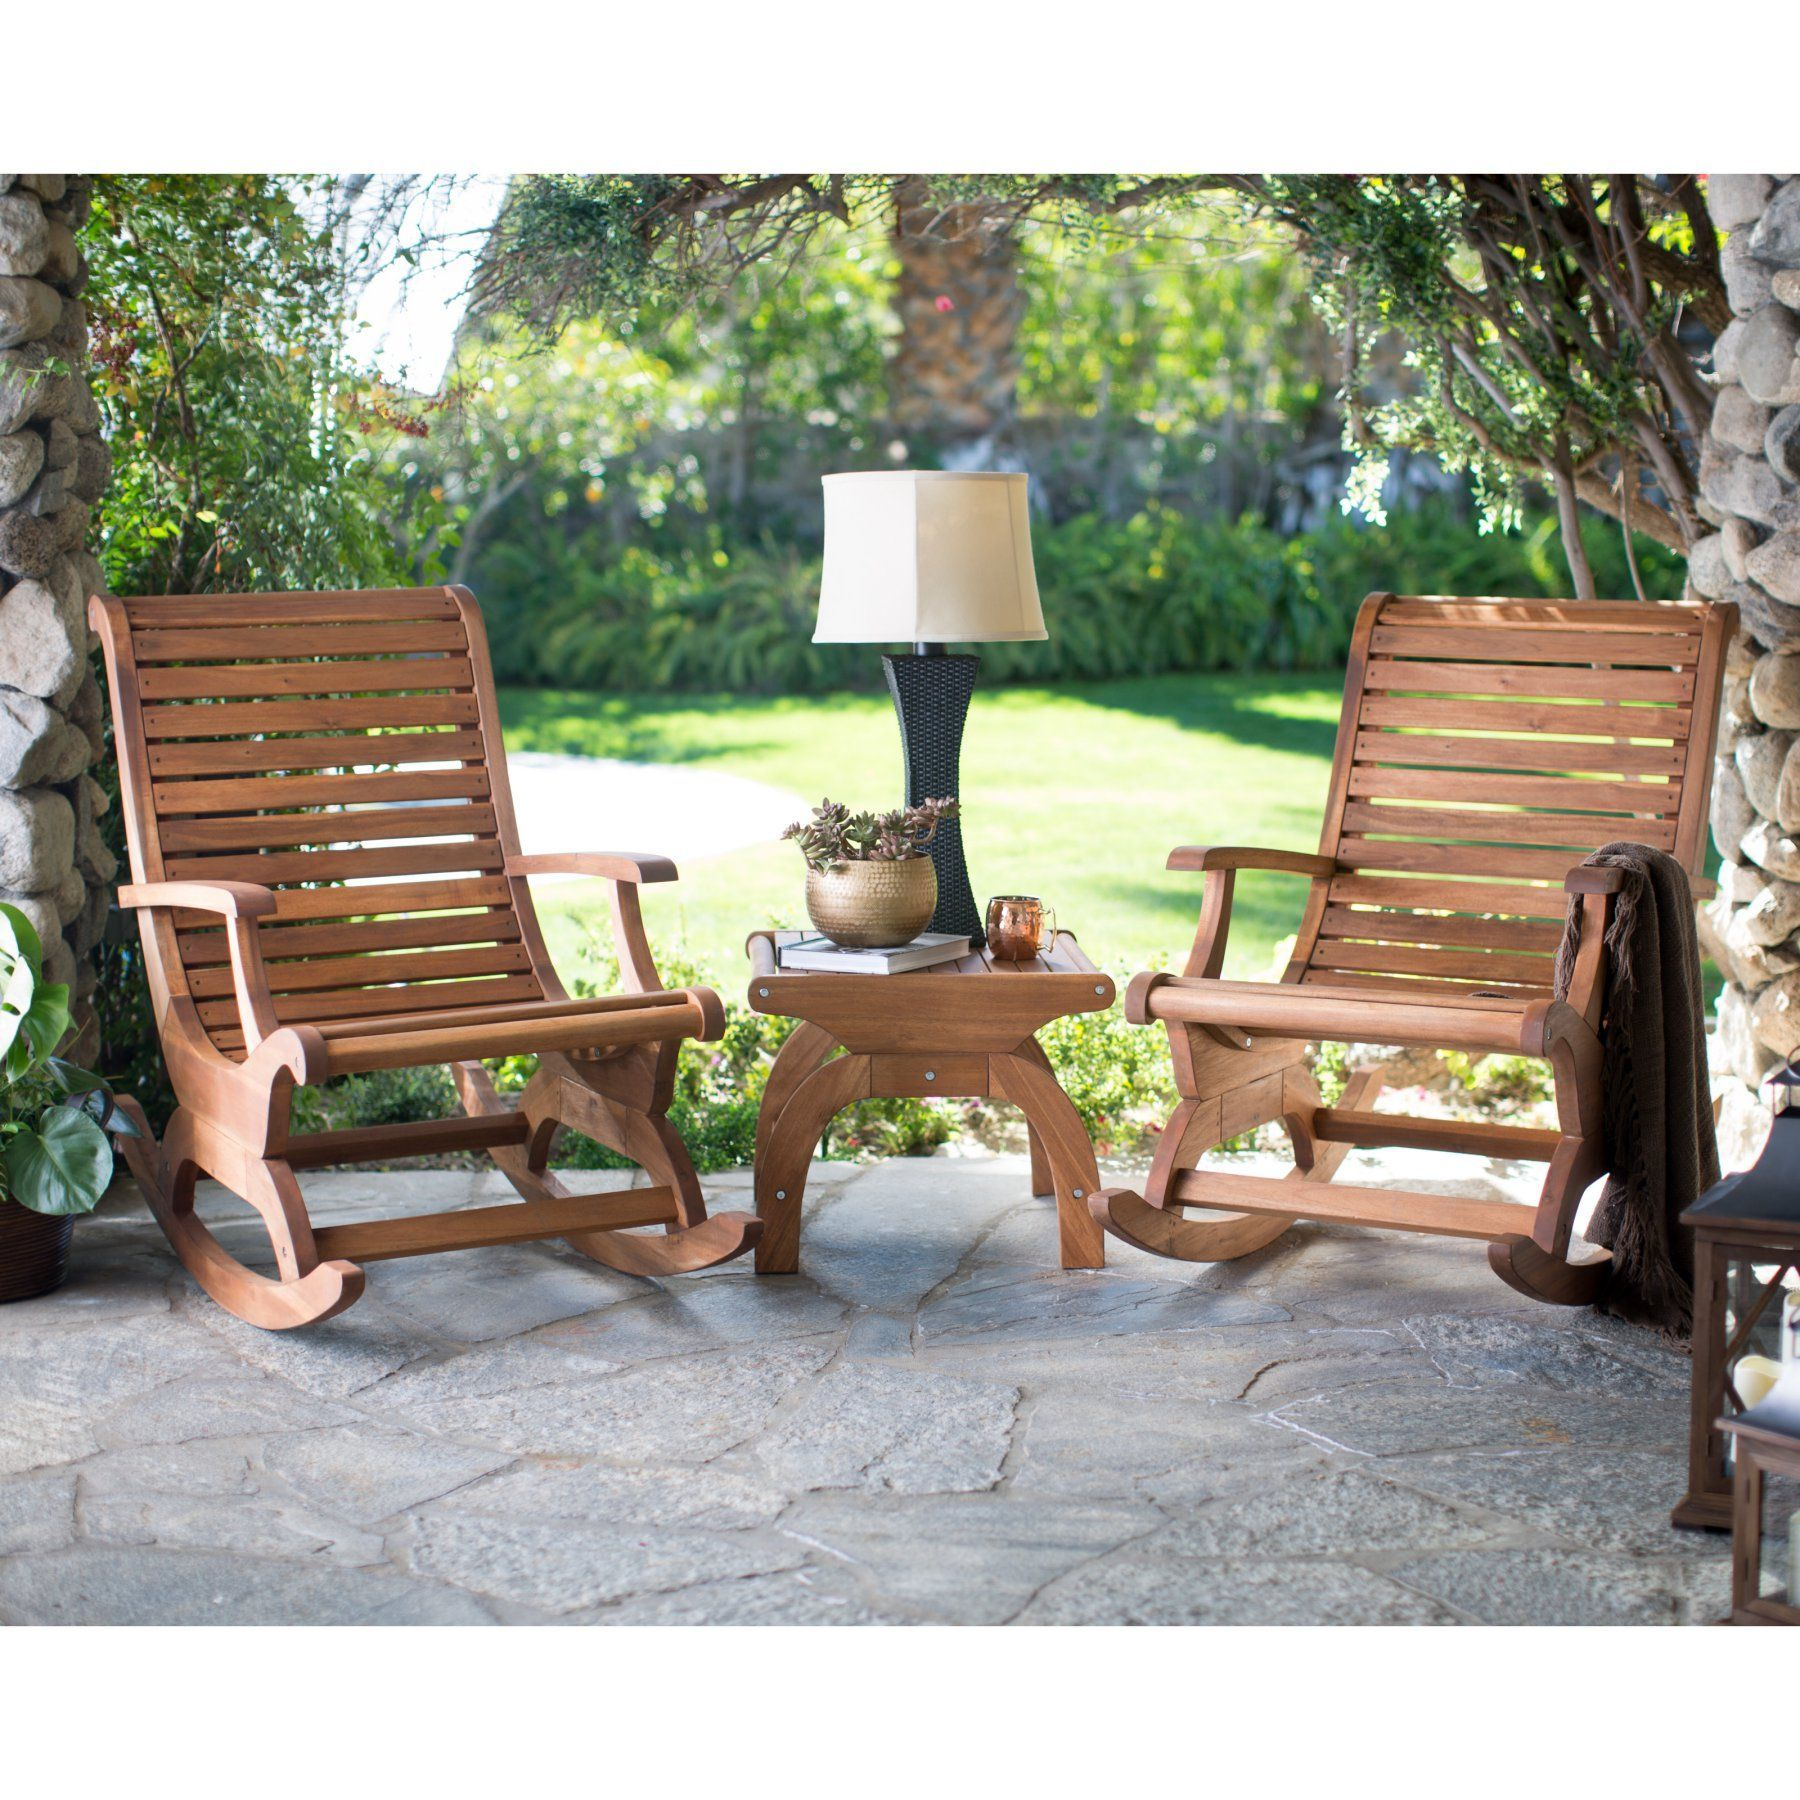 Outdoor Belham Living Avondale Wood Rocking Chair Set